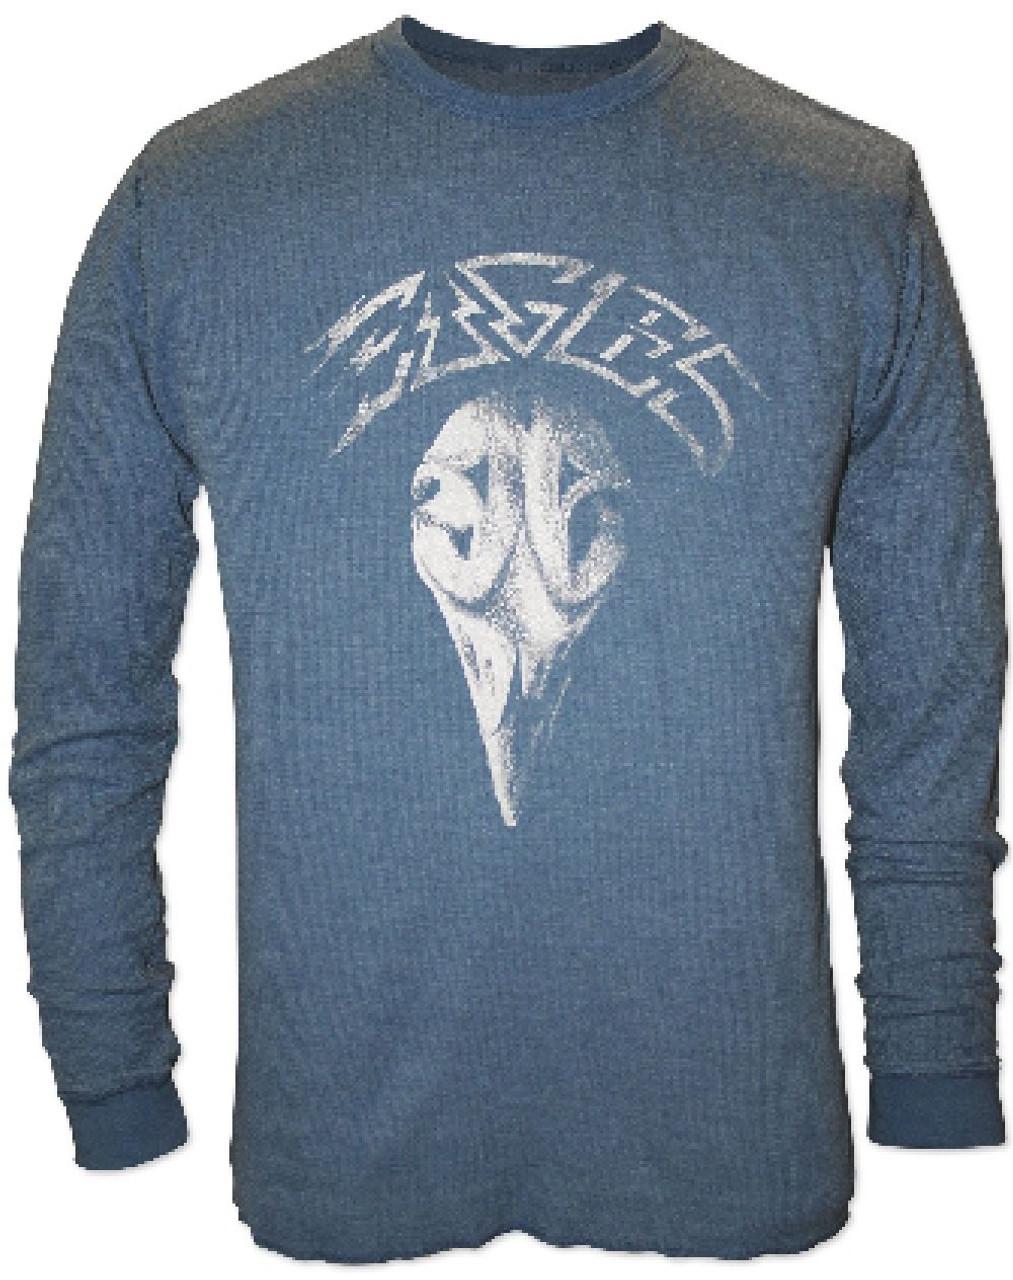 6e9d7801cb6c Eagles T Shirts Hotel California